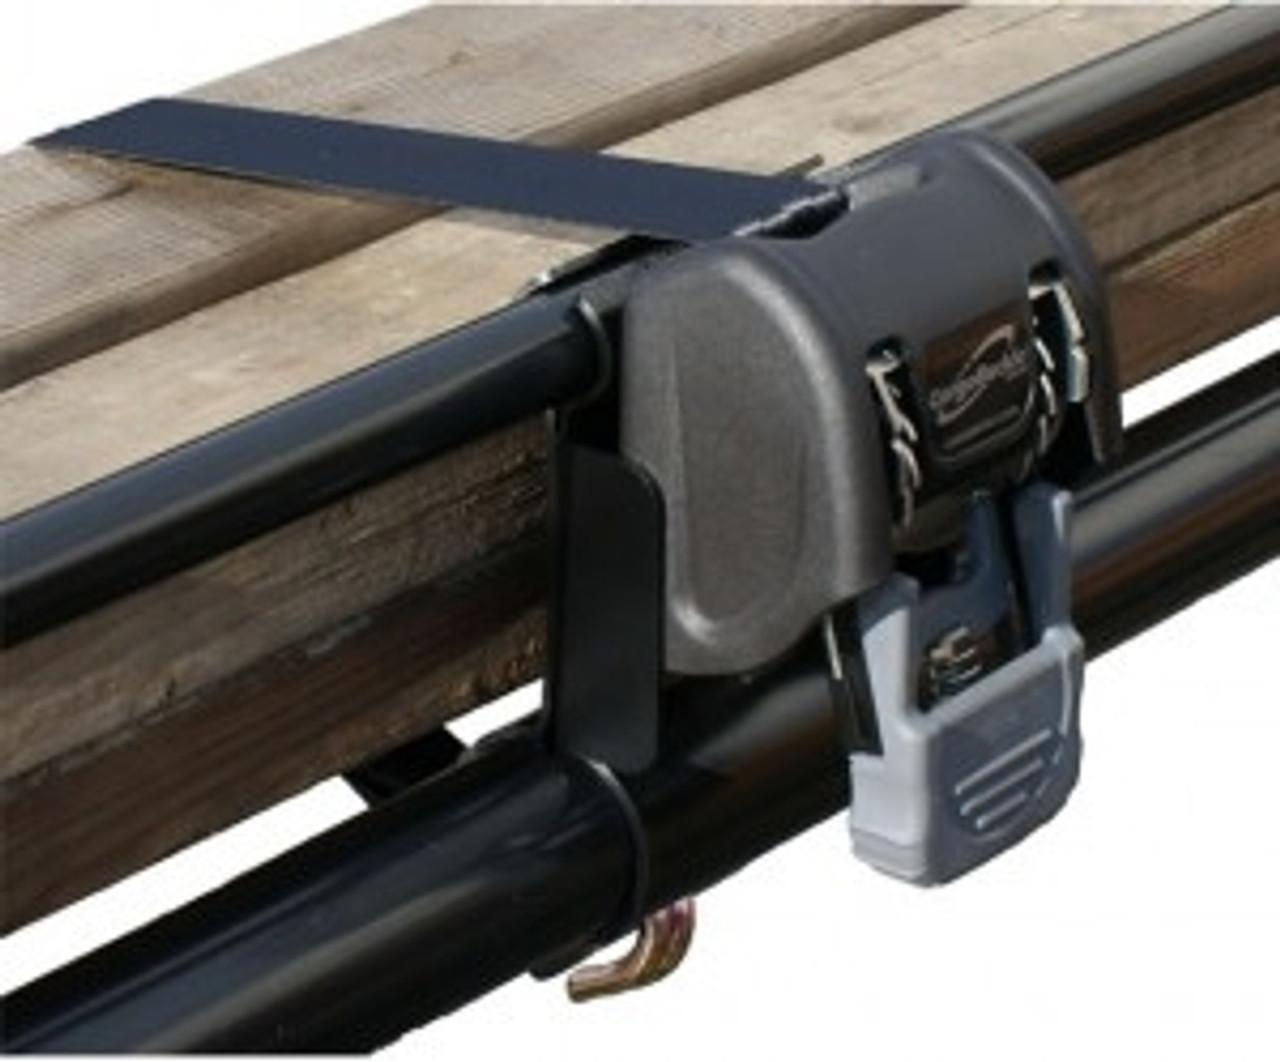 https leonardaccessories com product cargo buckle ratchet strap tie downs